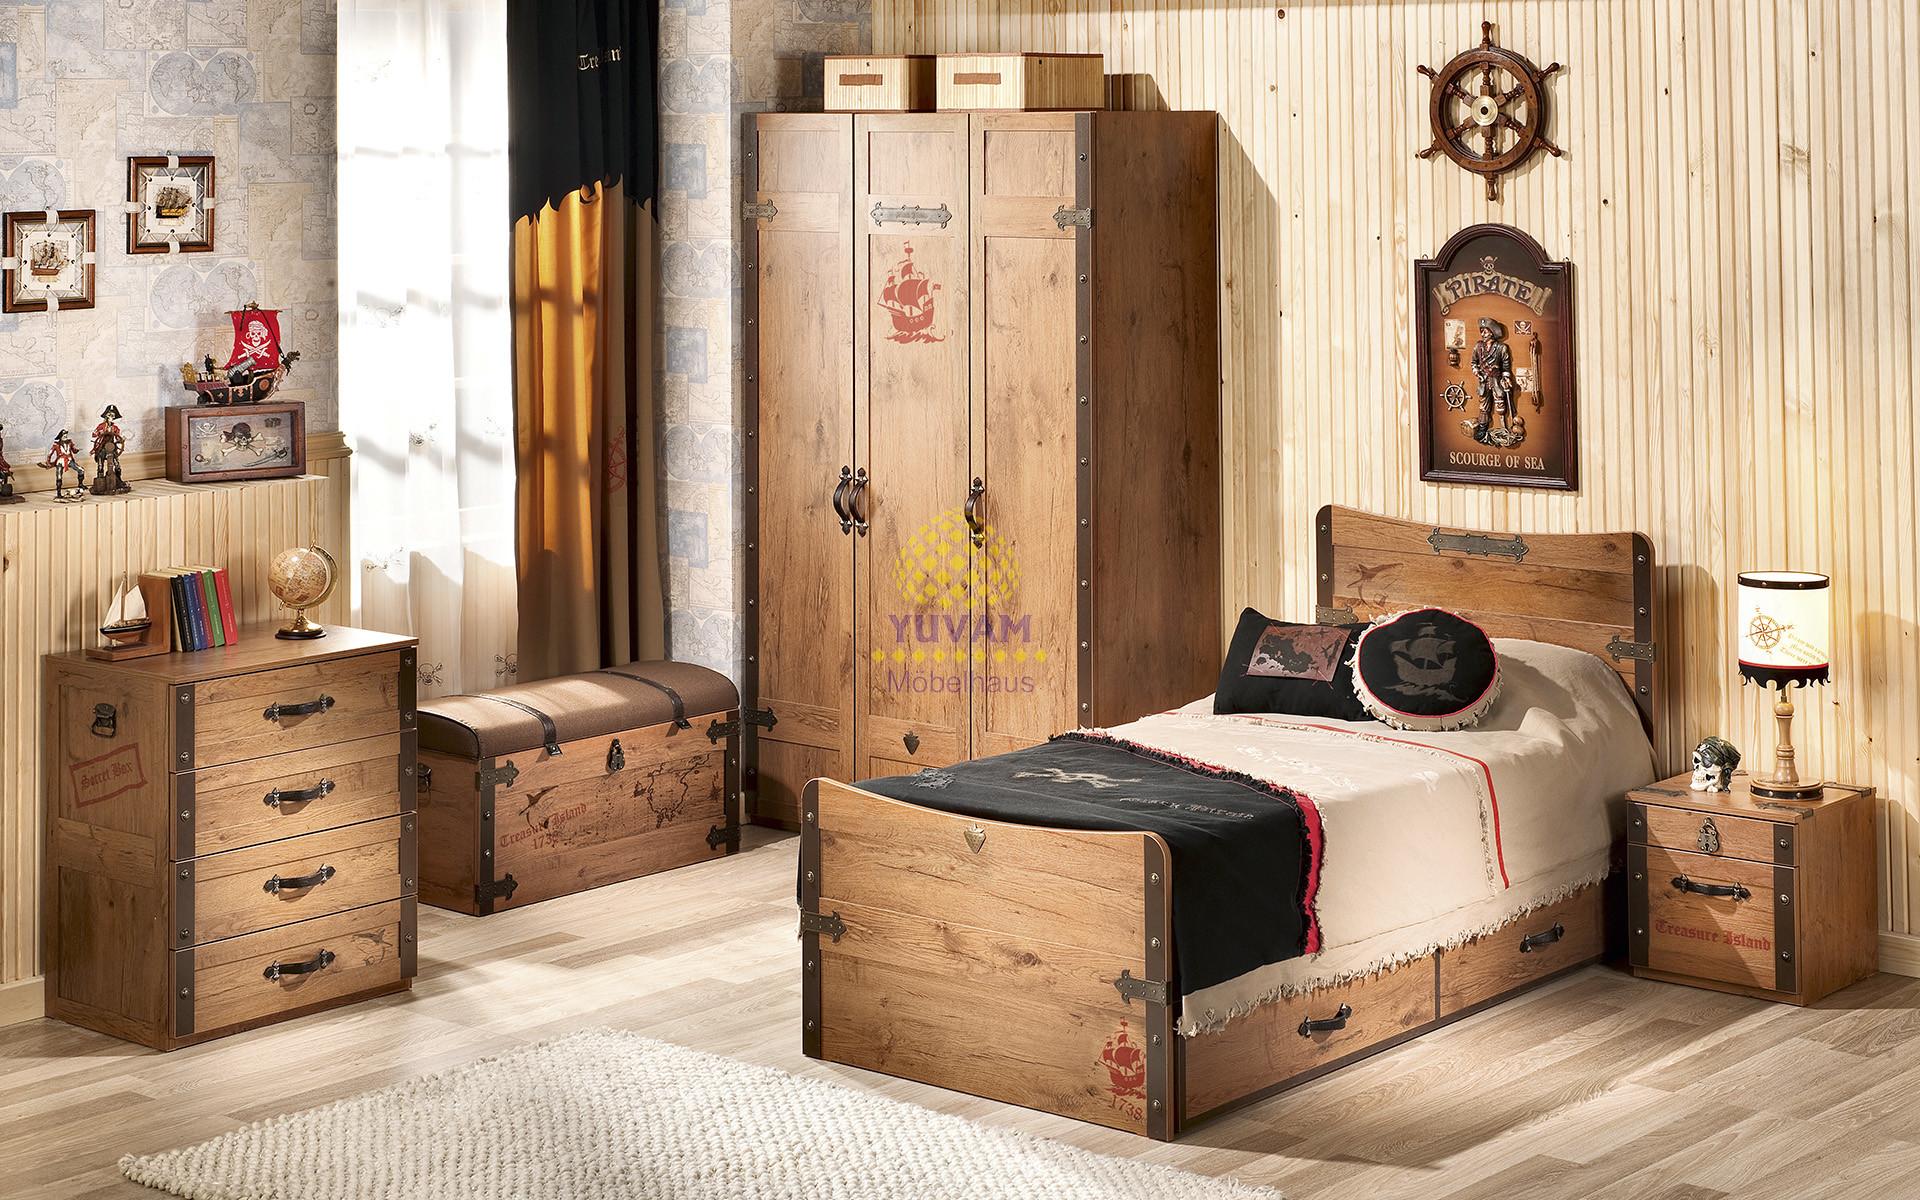 Full Size of Piraten Kinderzimmer Cilek Pirate Standart Mbel Europa Regale Regal Weiß Sofa Kinderzimmer Piraten Kinderzimmer